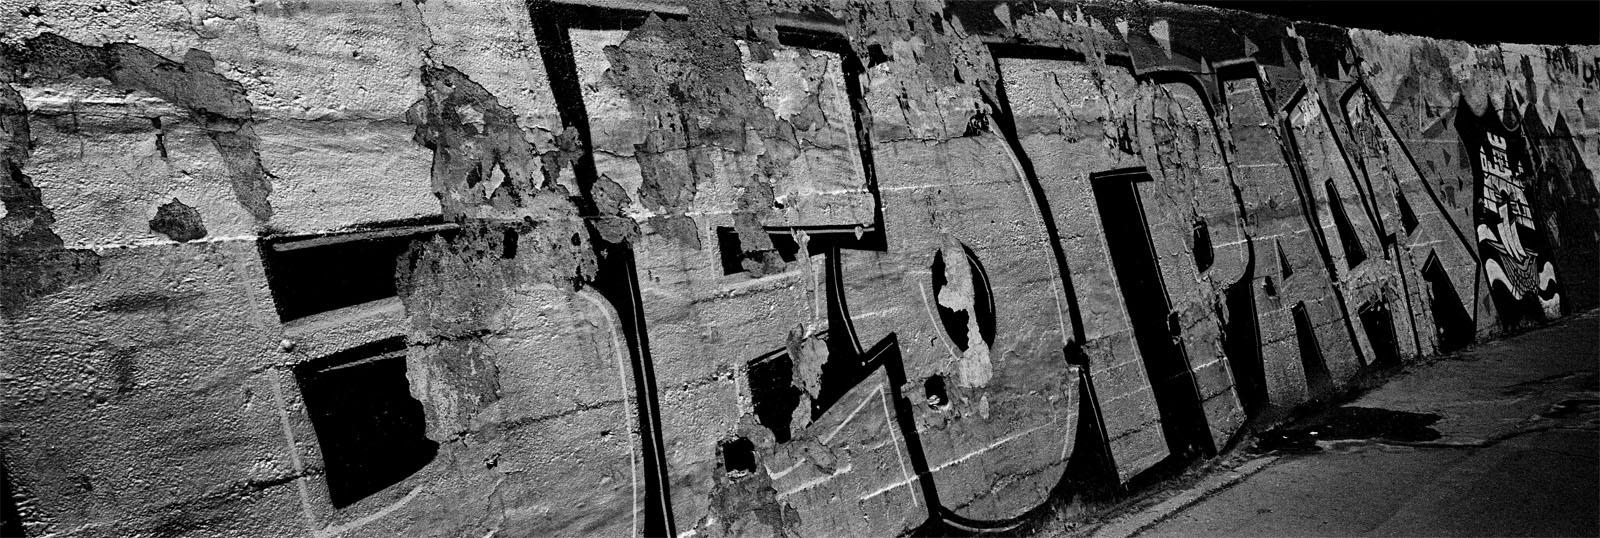 Art and Documentary Photography - Loading BGD___Fabio_Sgroi_017.jpg